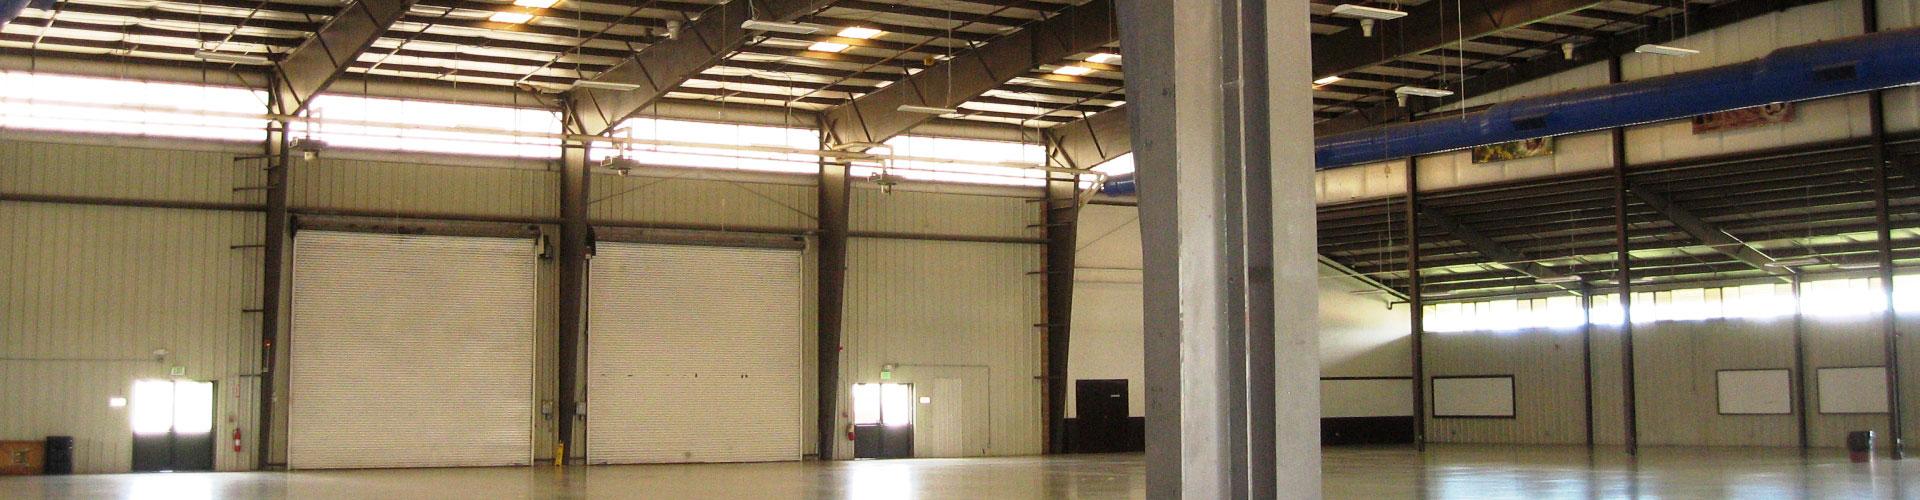 Destratification Fan System Warehouses Slider 1